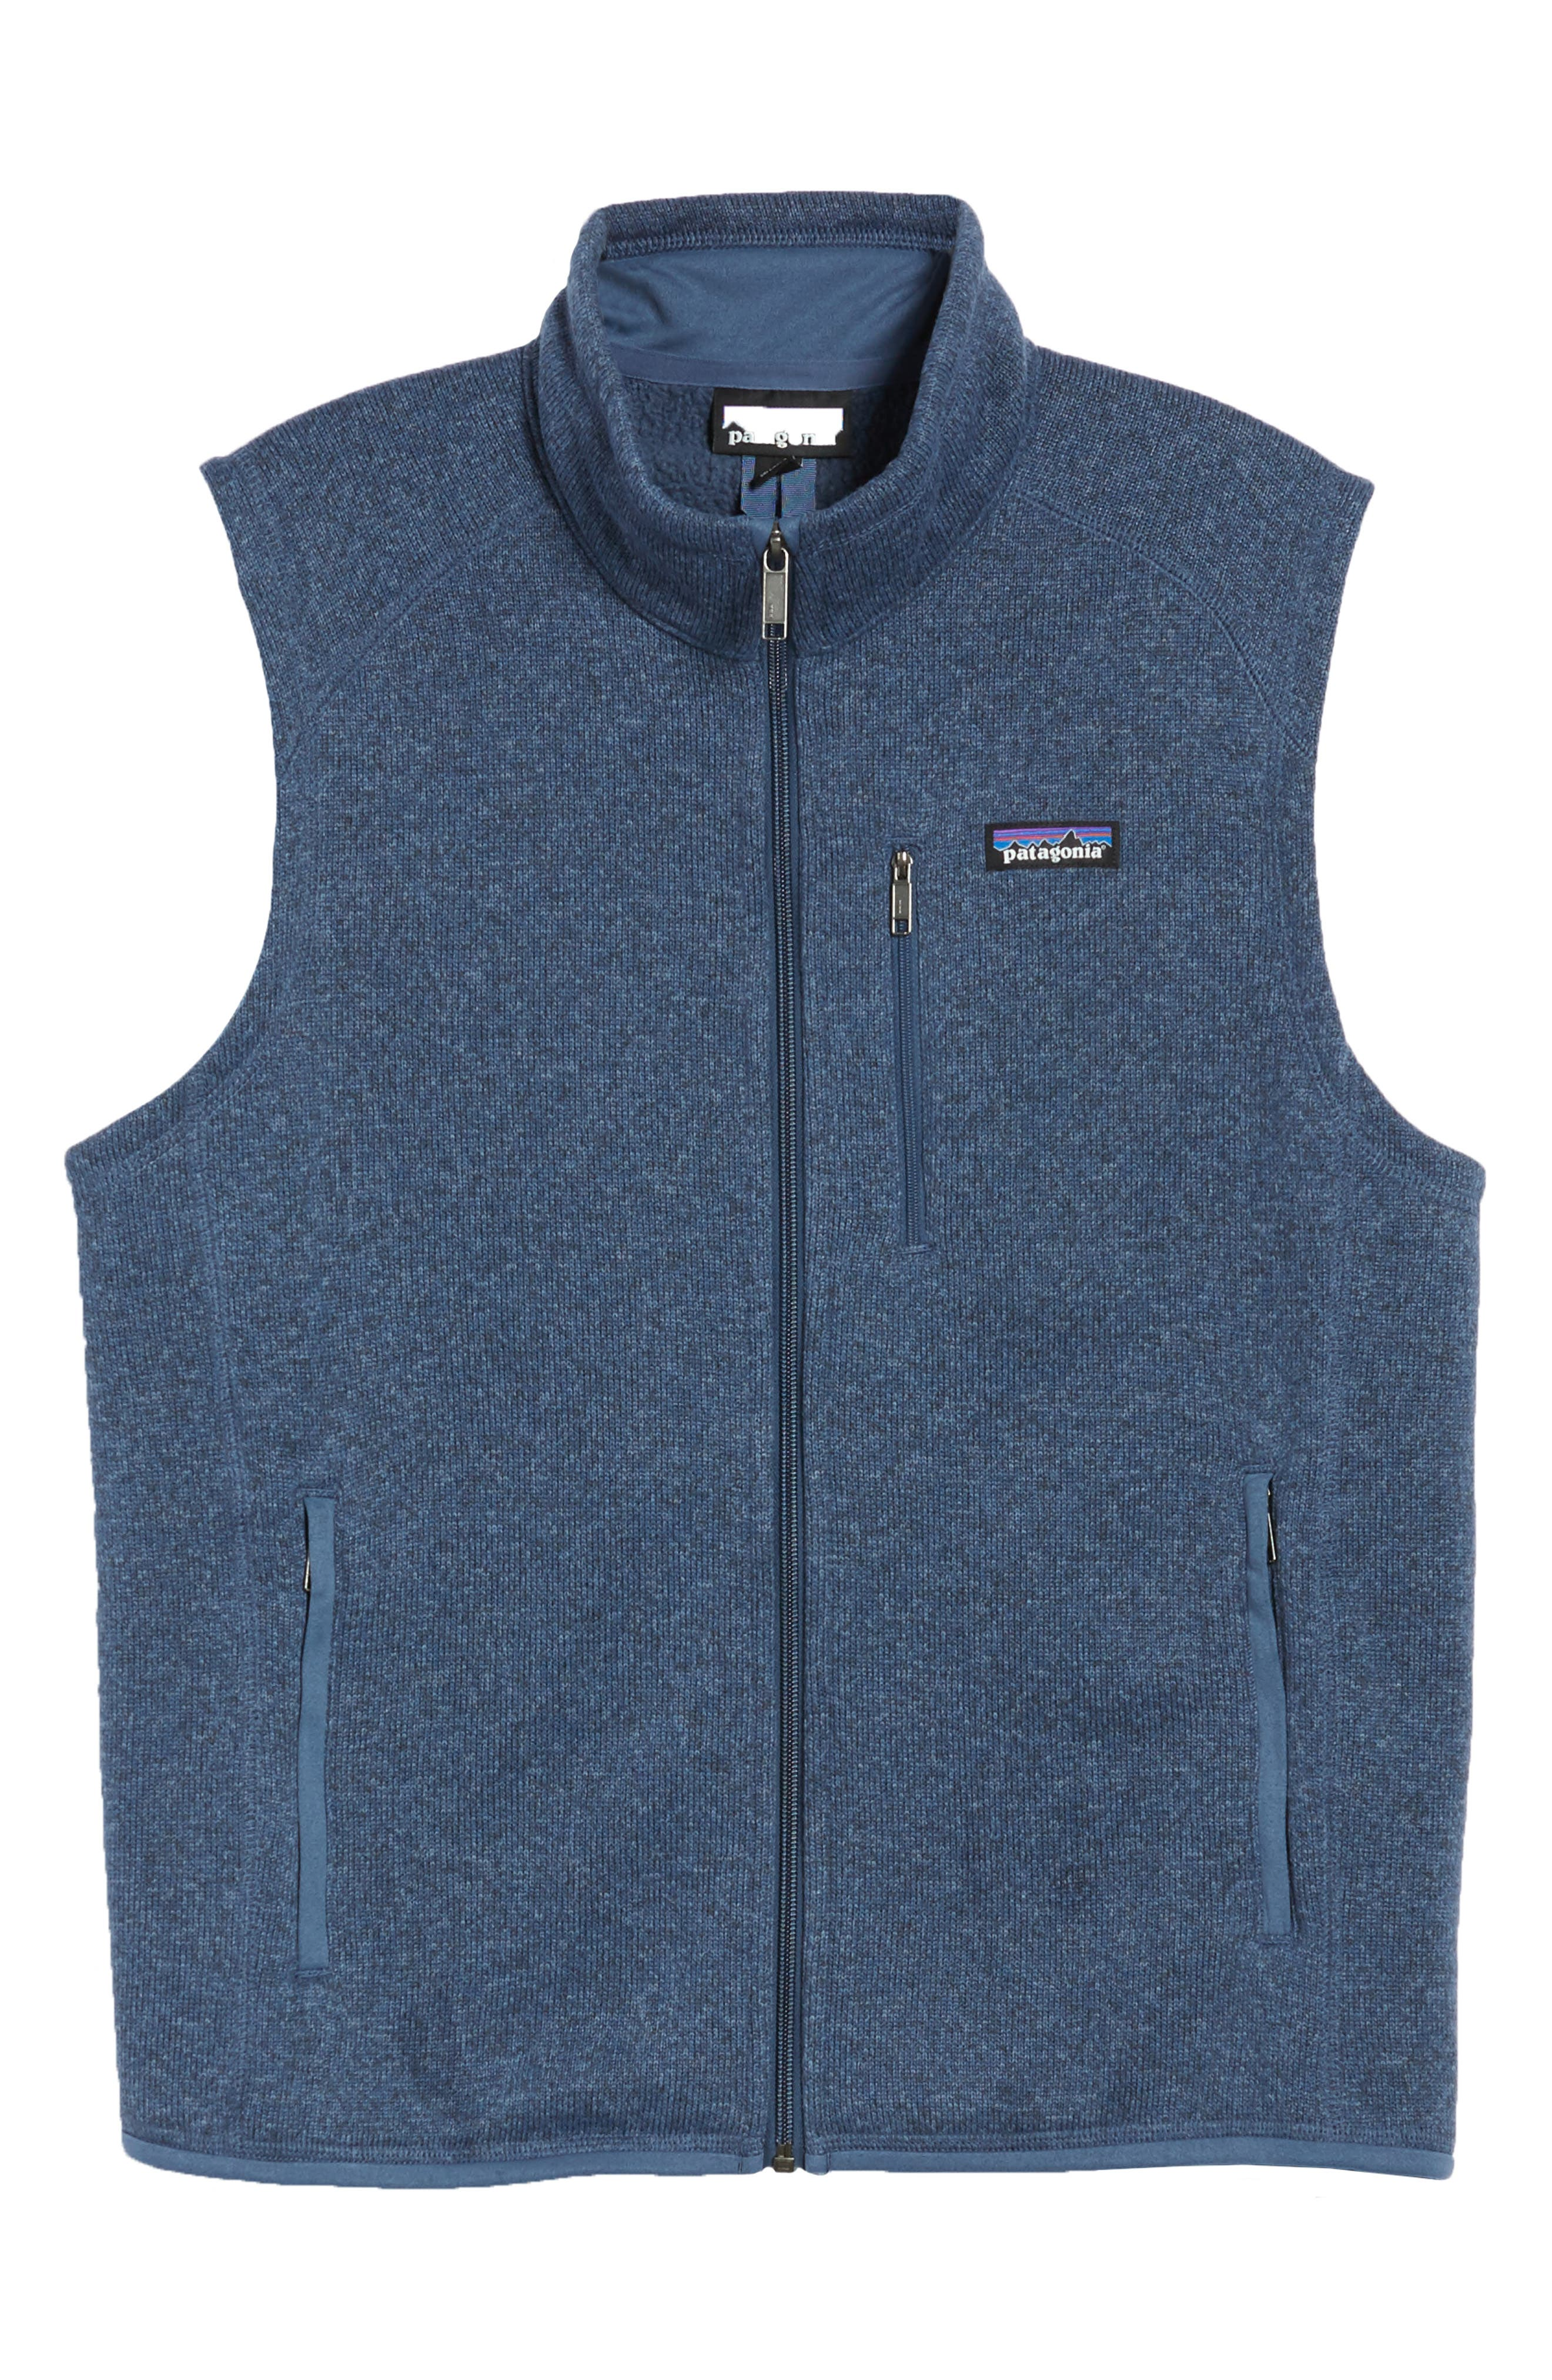 PATAGONIA, 'Better Sweater' Zip Front Vest, Alternate thumbnail 6, color, DOLOMITE BLUE